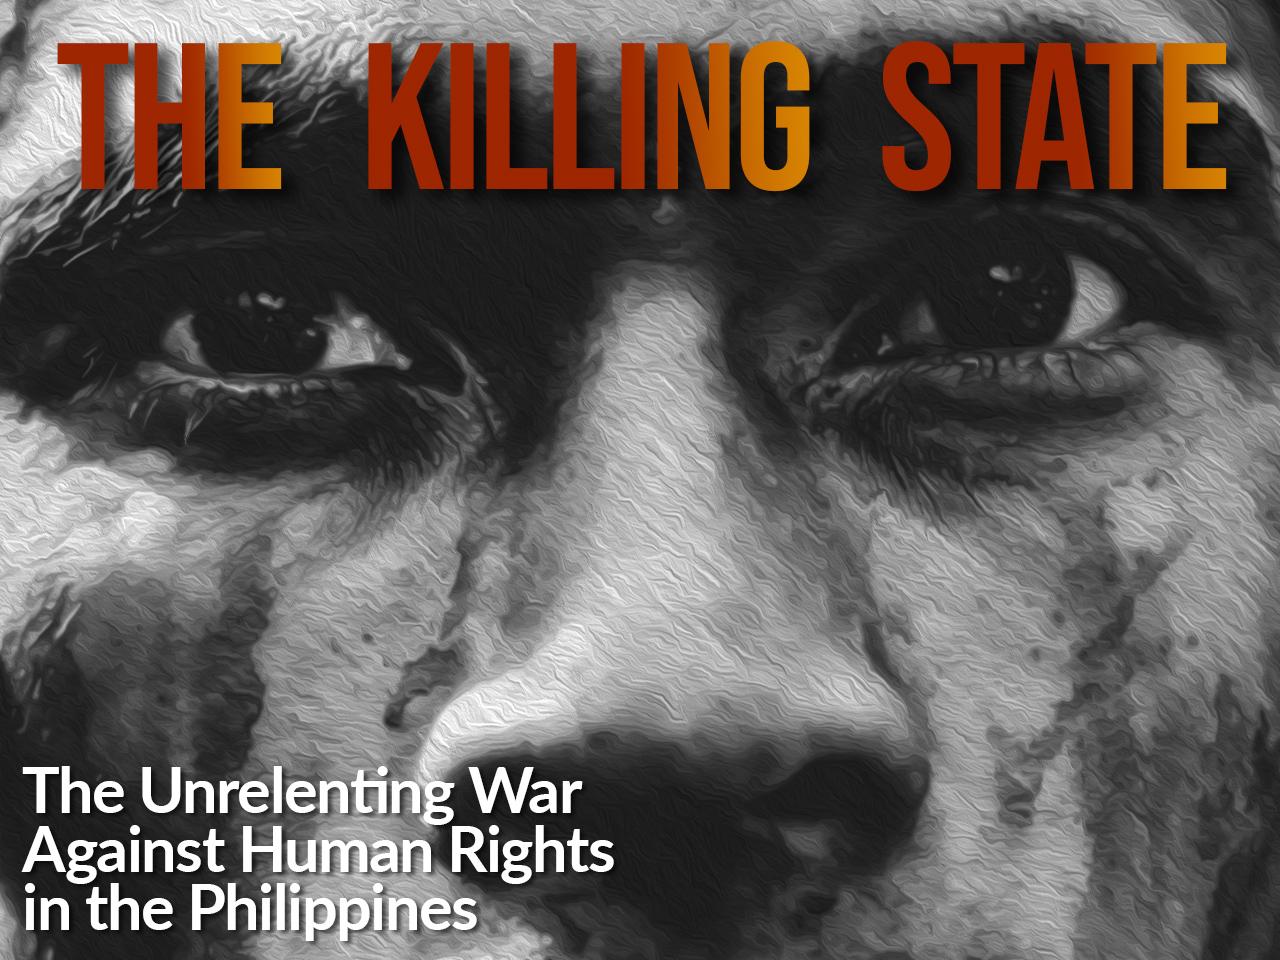 Ang Kapitbahay 2003 Tagalog Movie the killing state: the unrelenting war against human rights